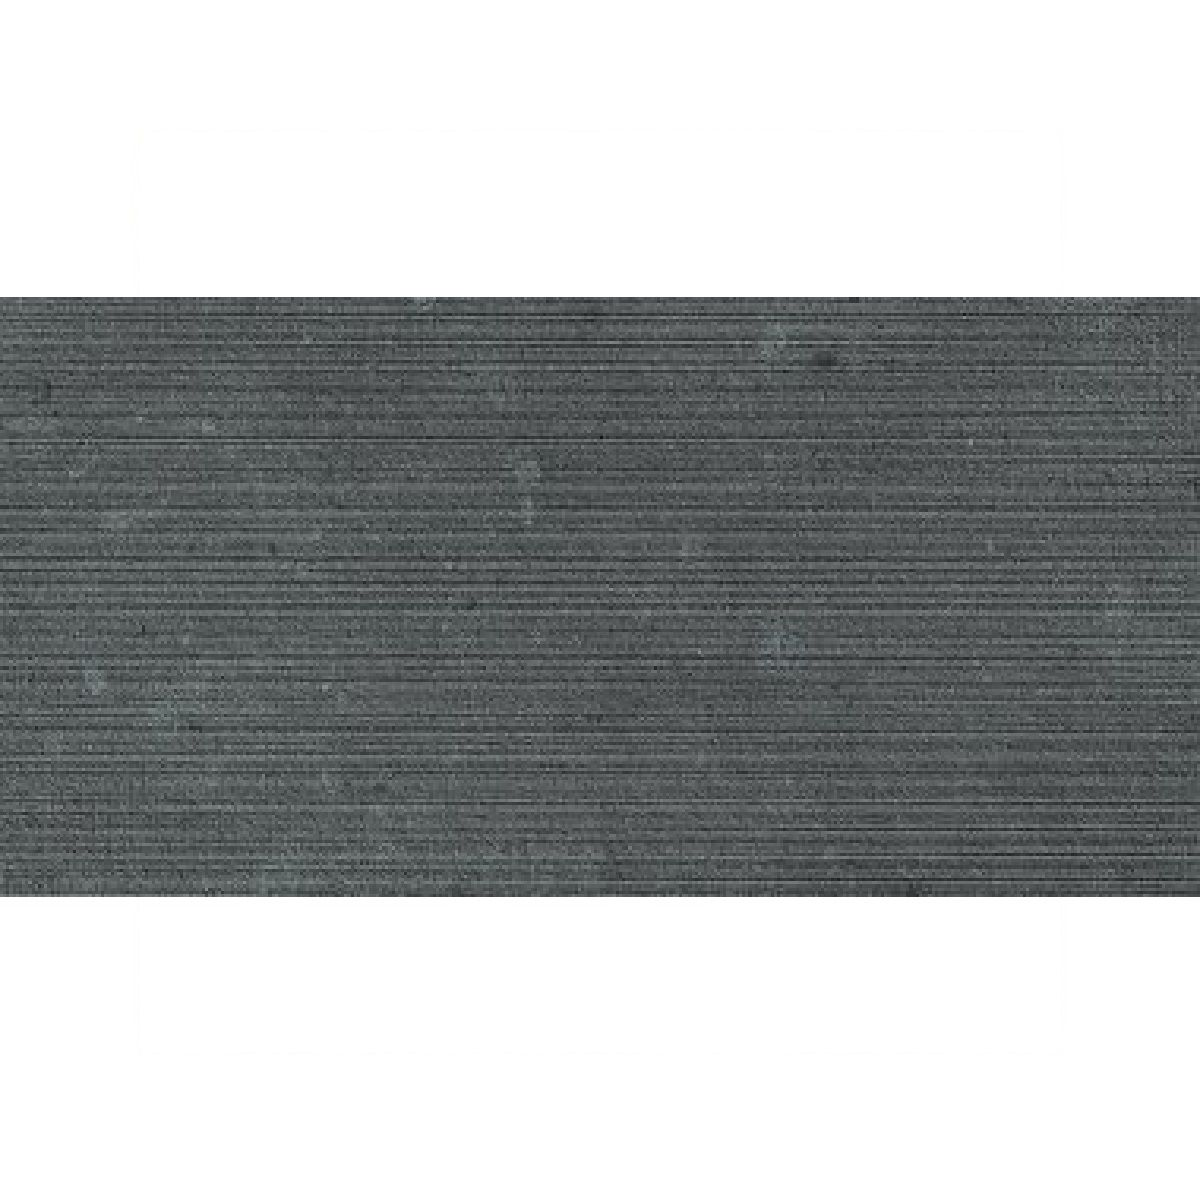 RAK Surface Ash Rustic Tile 300 x 600mm